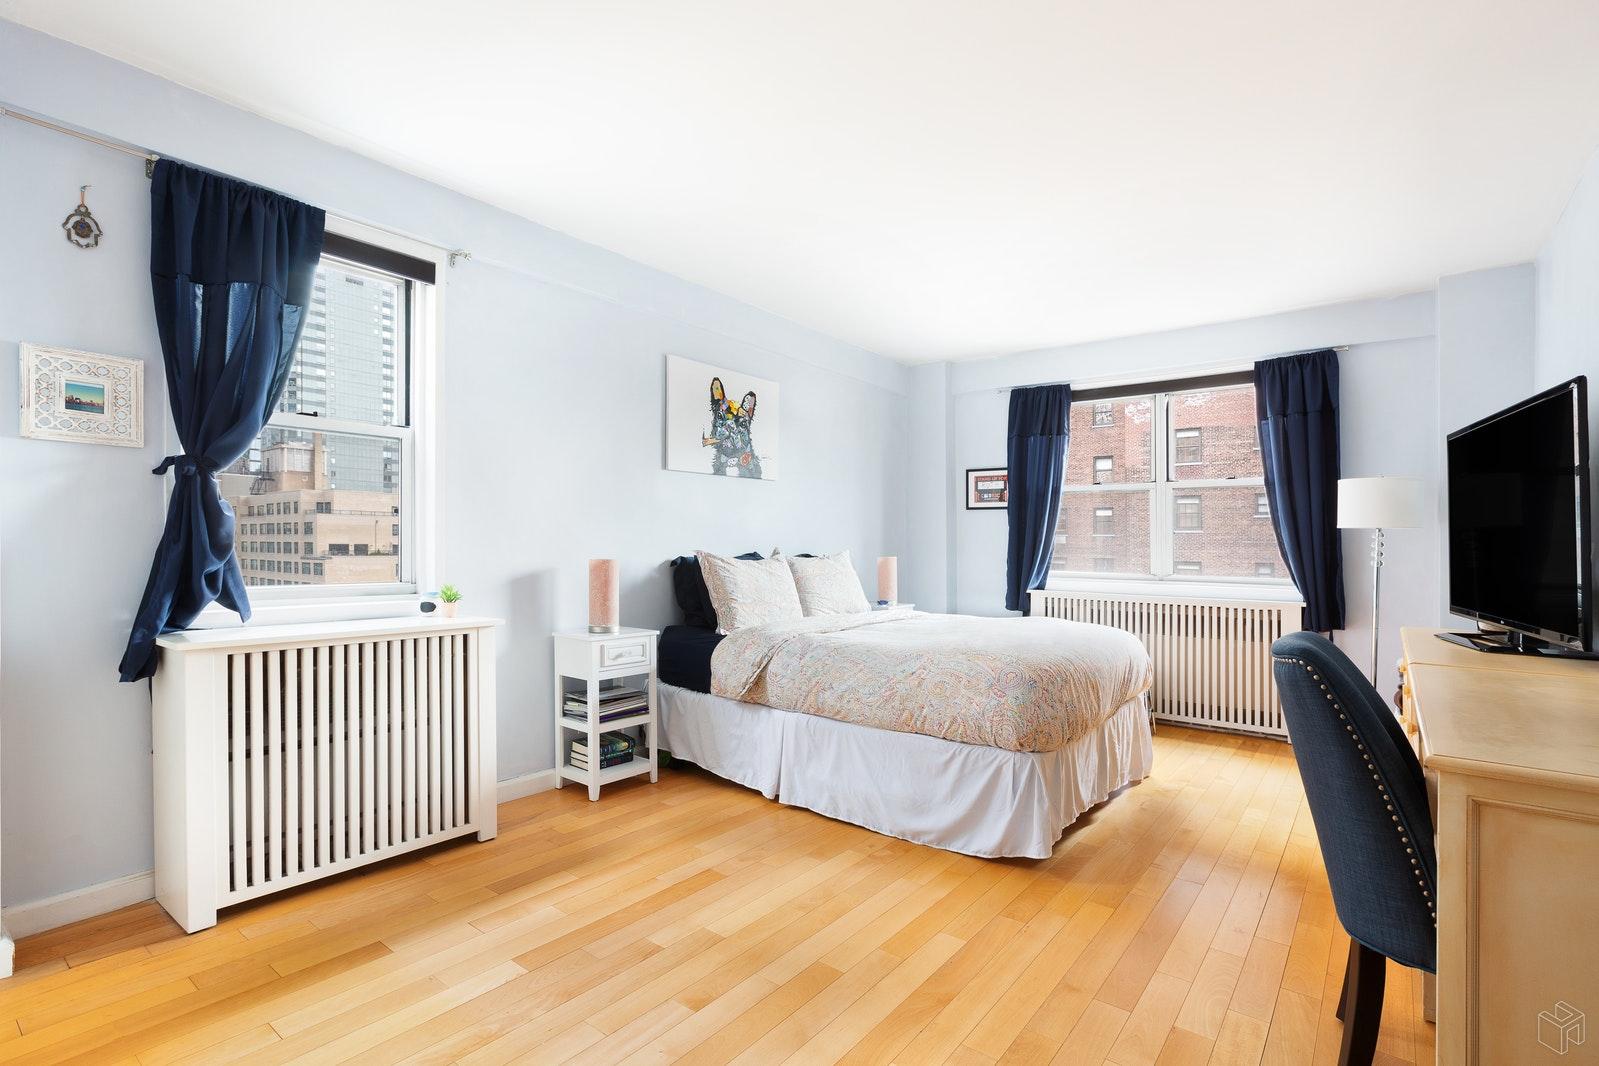 345 WEST 58TH STREET 15R, Upper West Side, $925,000, Web #: 19425687